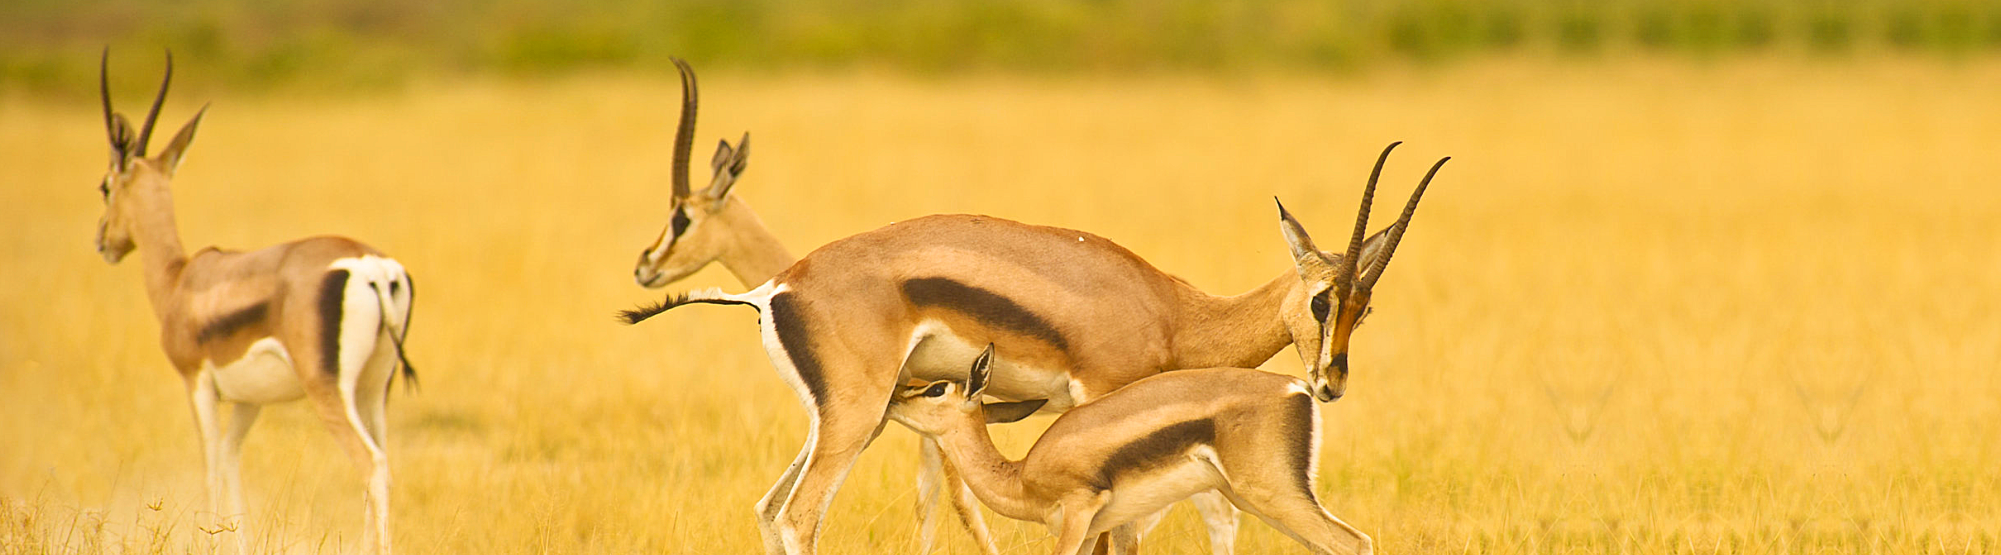 wild antilope